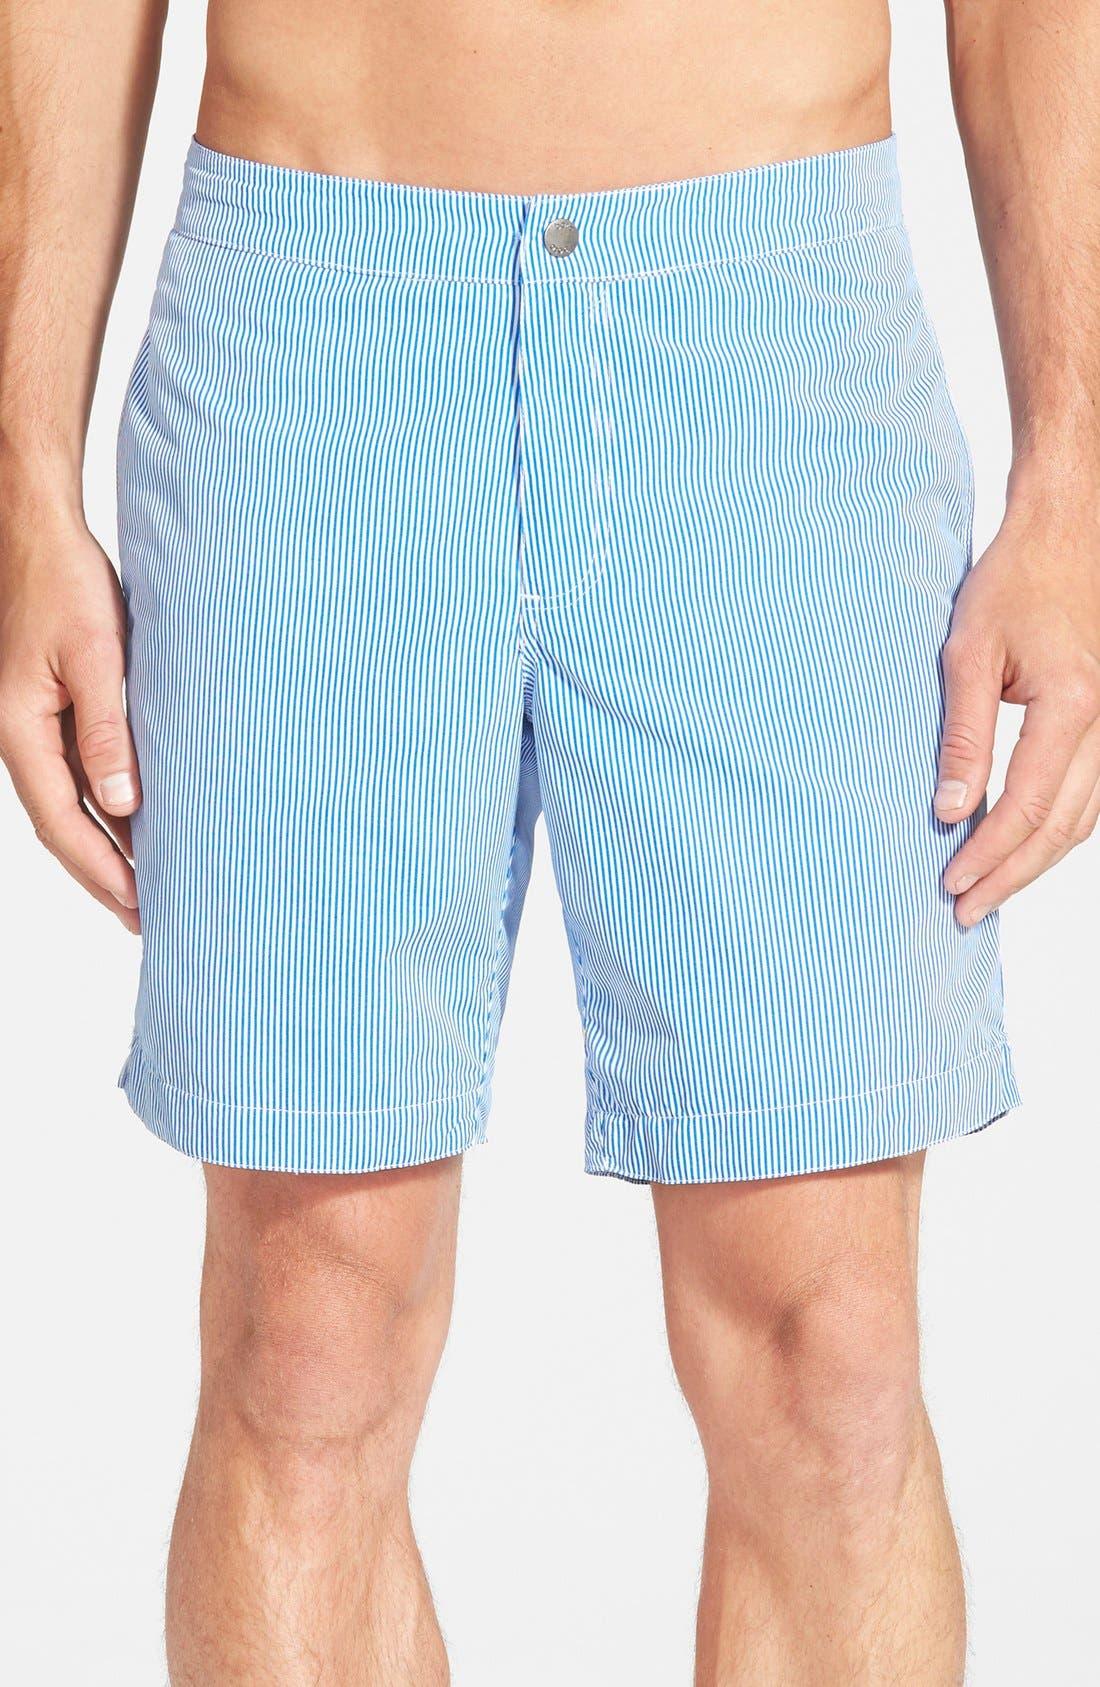 Alternate Image 1 Selected - boto 'Aruba - Stripe' Tailored Fit 8.5 Inch Board Shorts